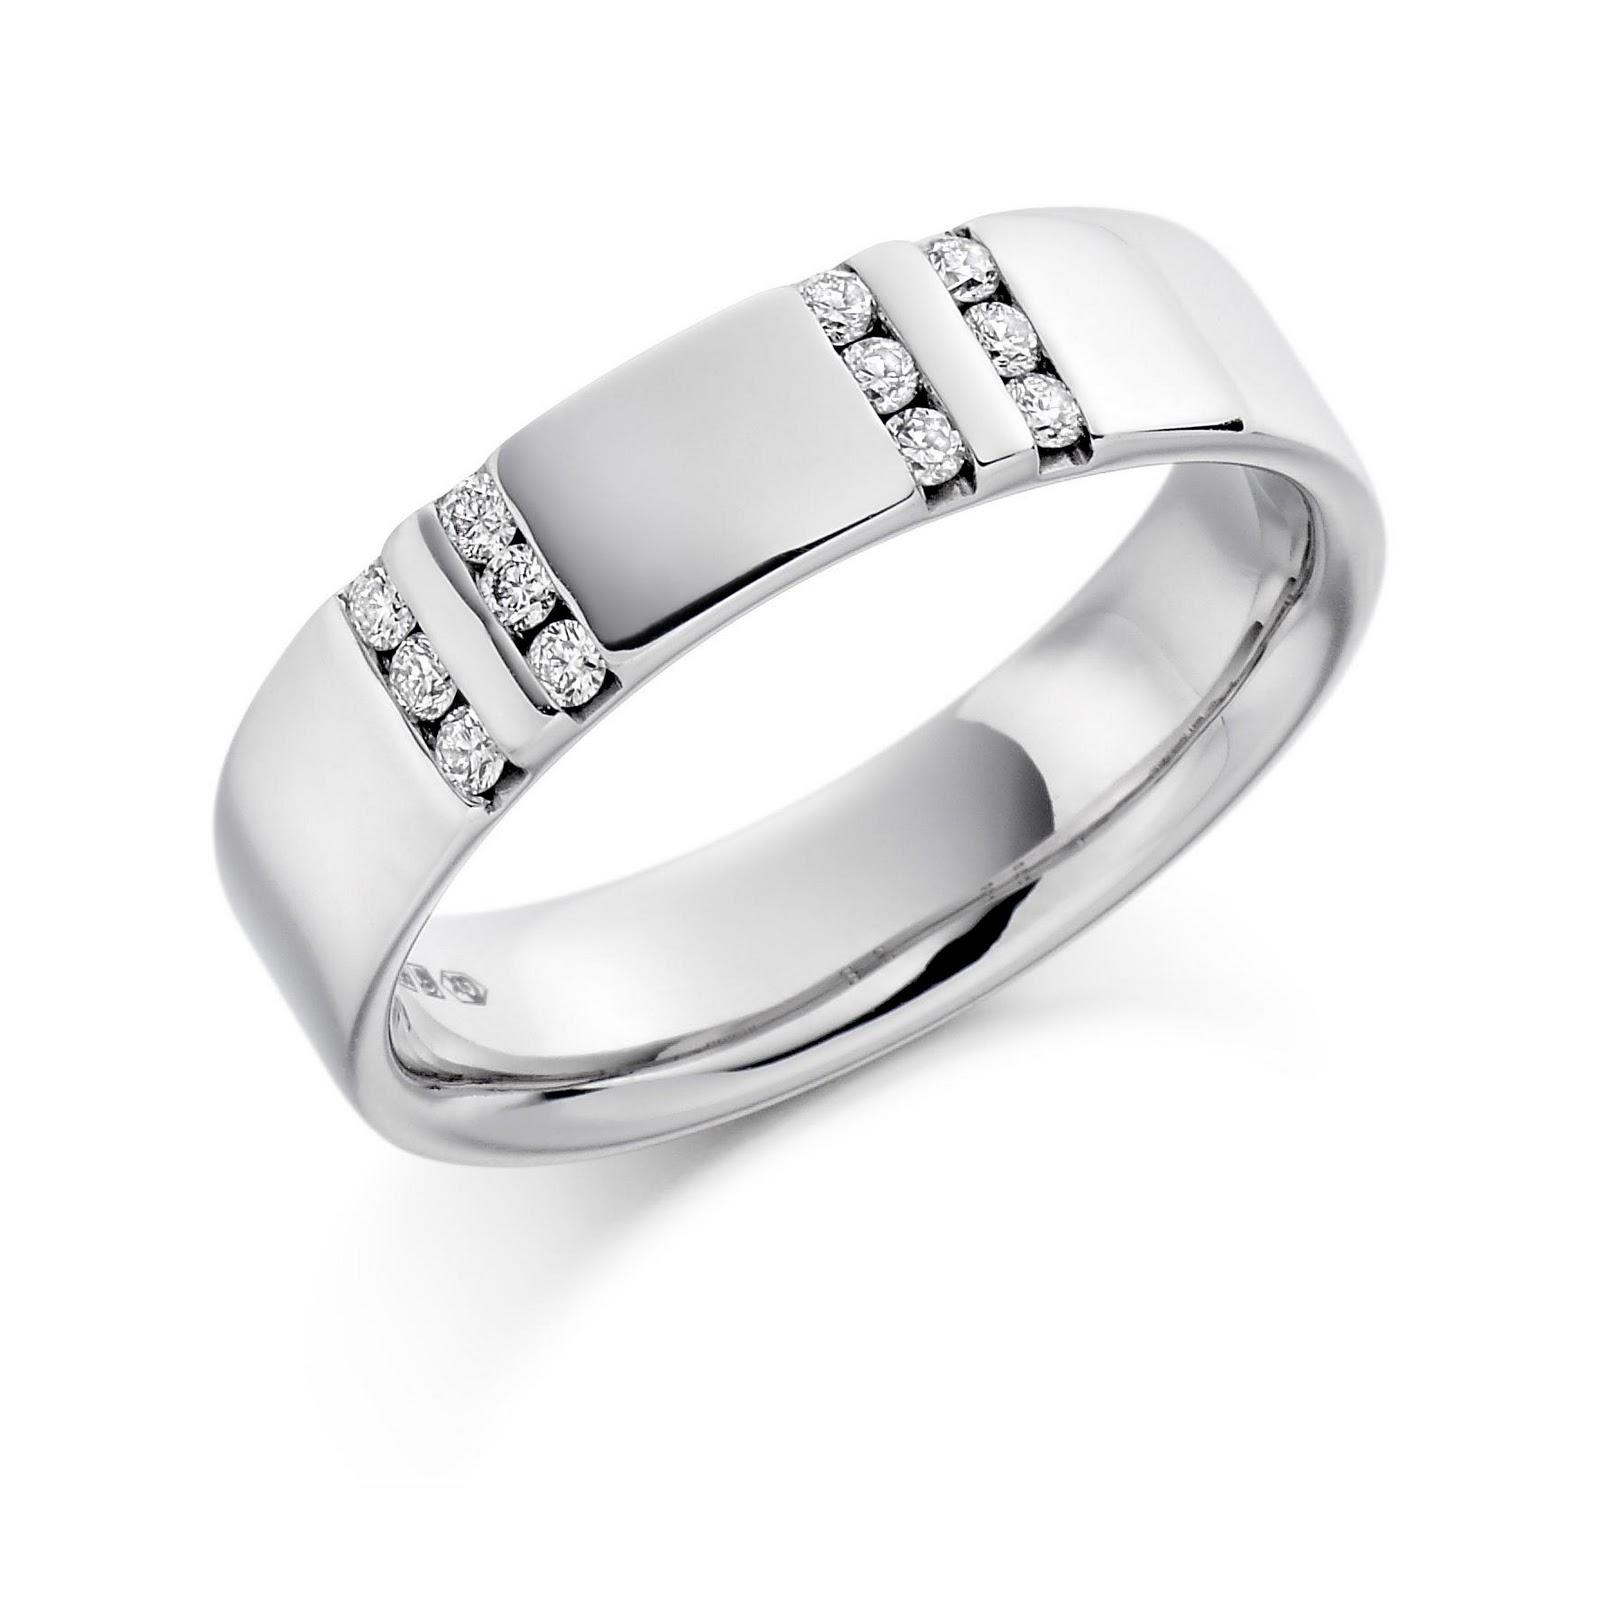 Band width: 5.80mm. Diamond